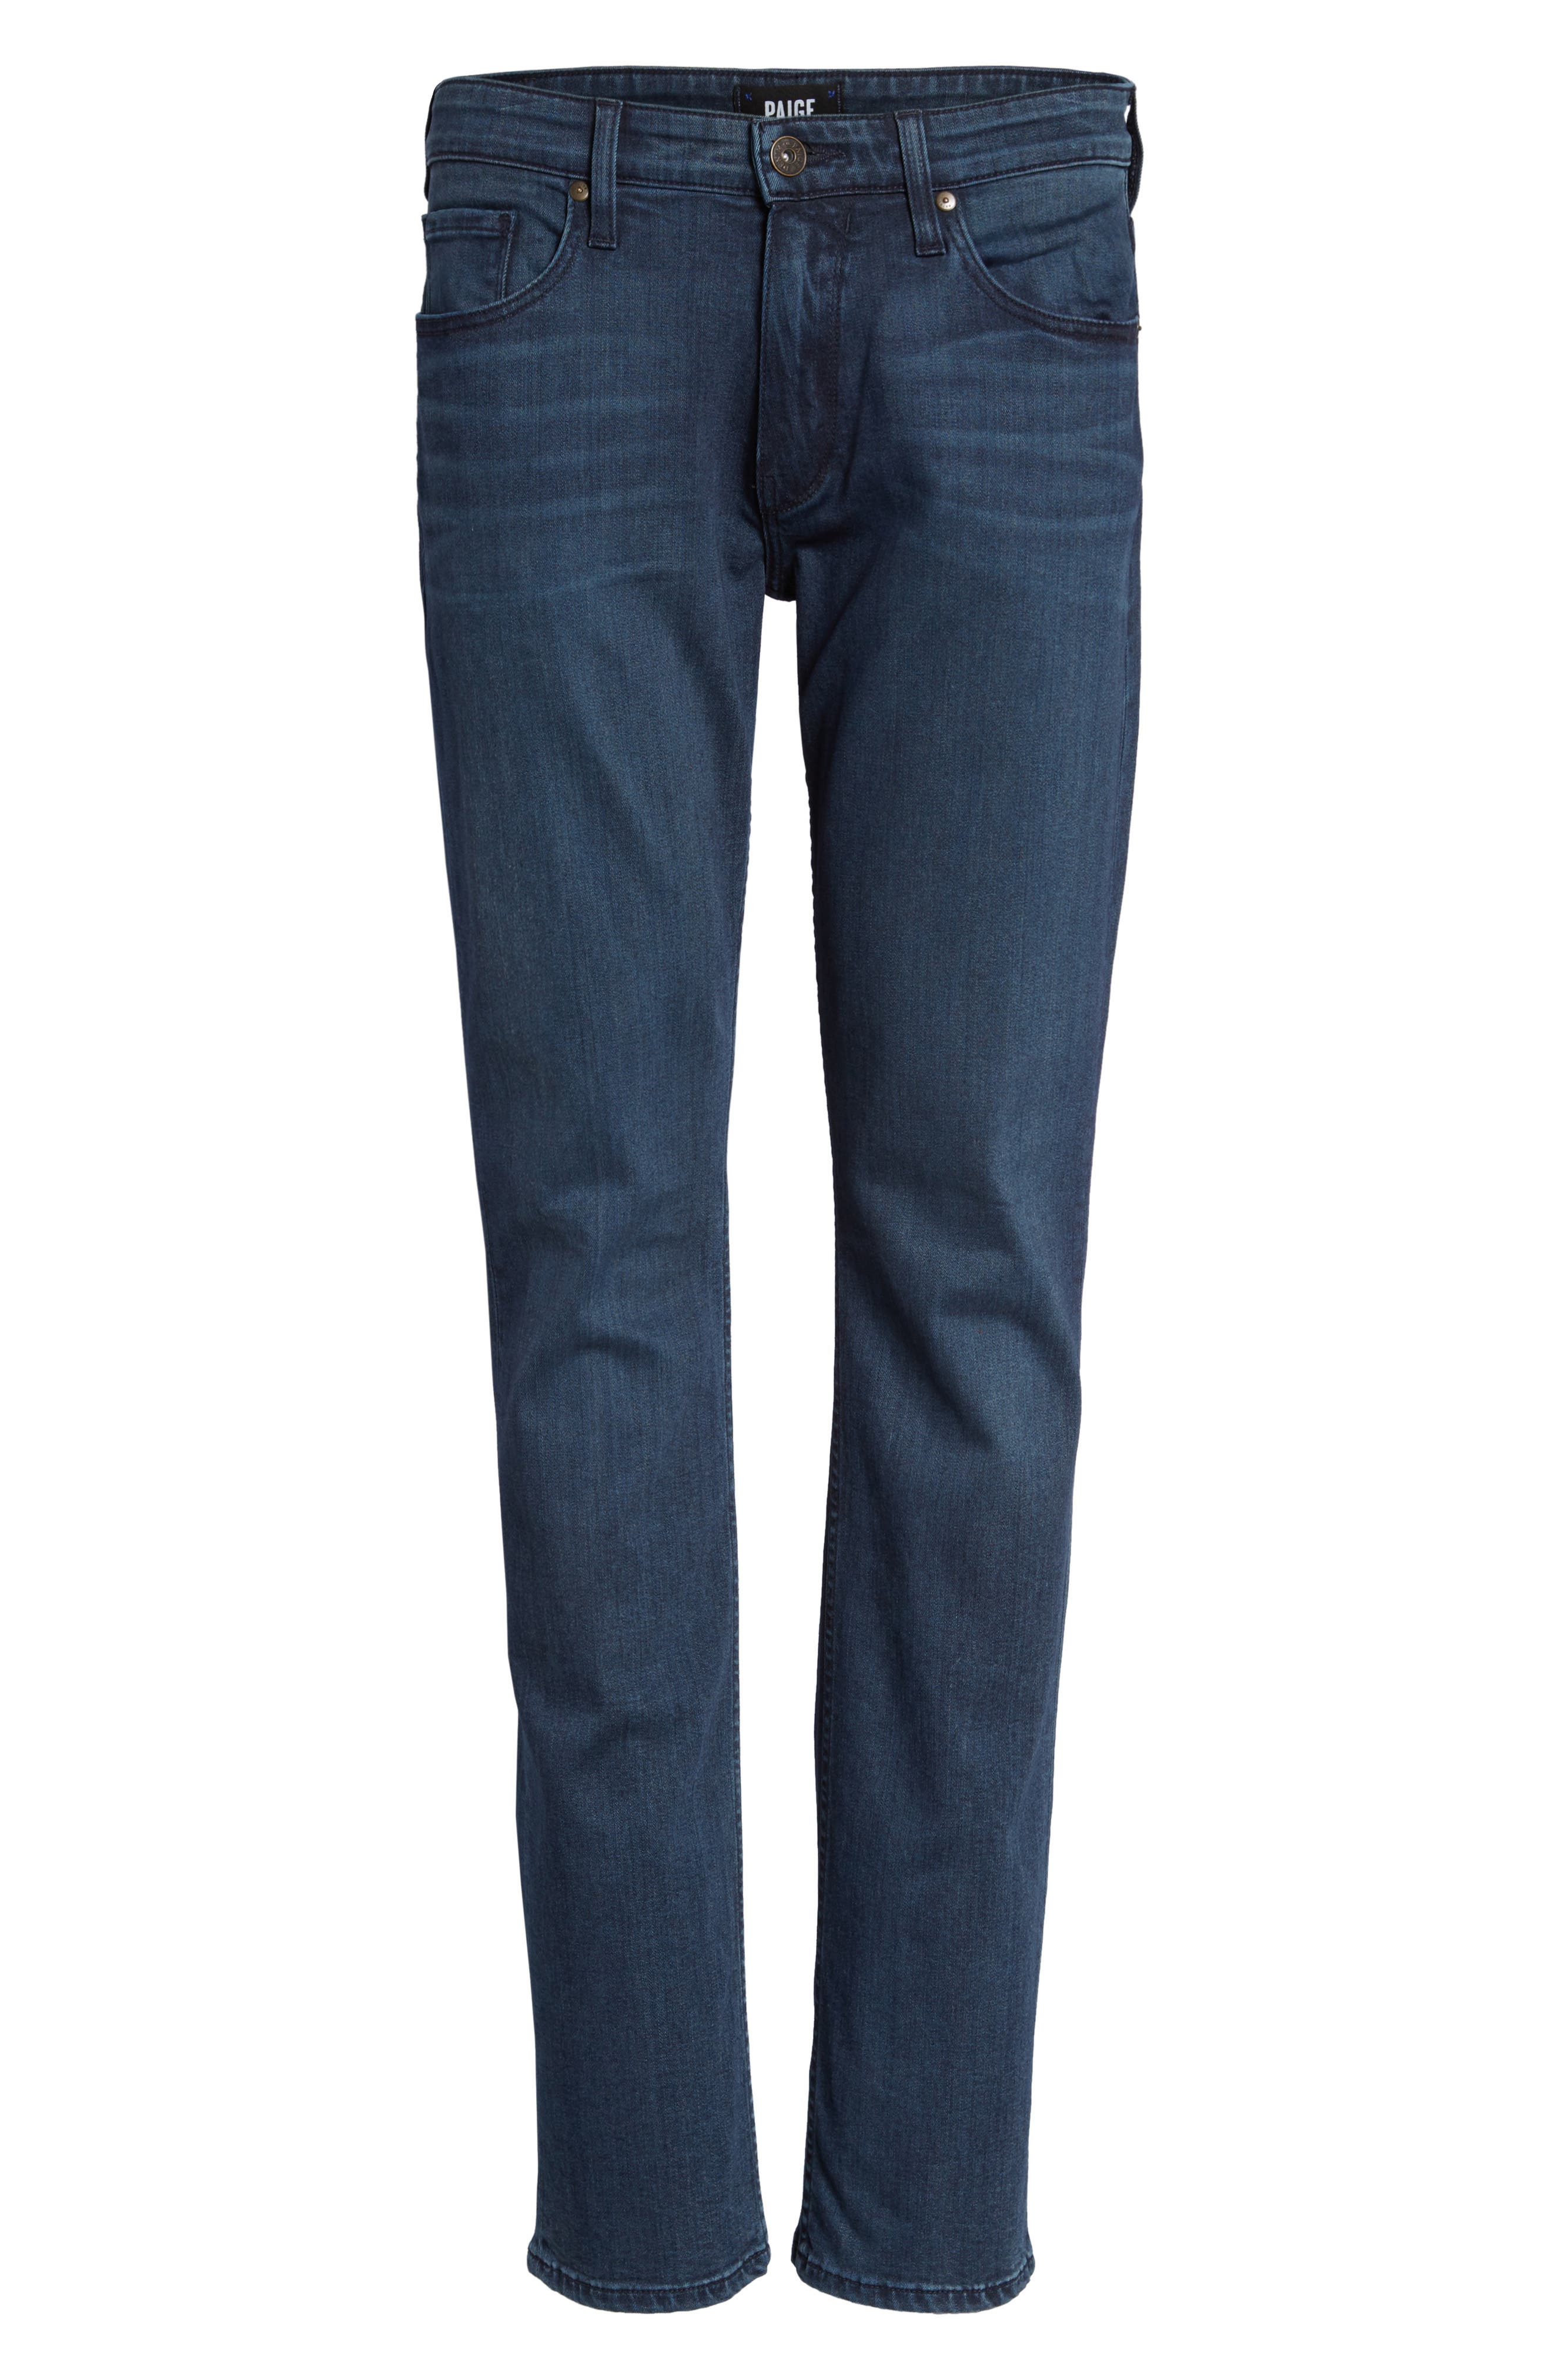 Transcend - Federal Slim Straight Fit Jeans,                             Alternate thumbnail 6, color,                             Elroy